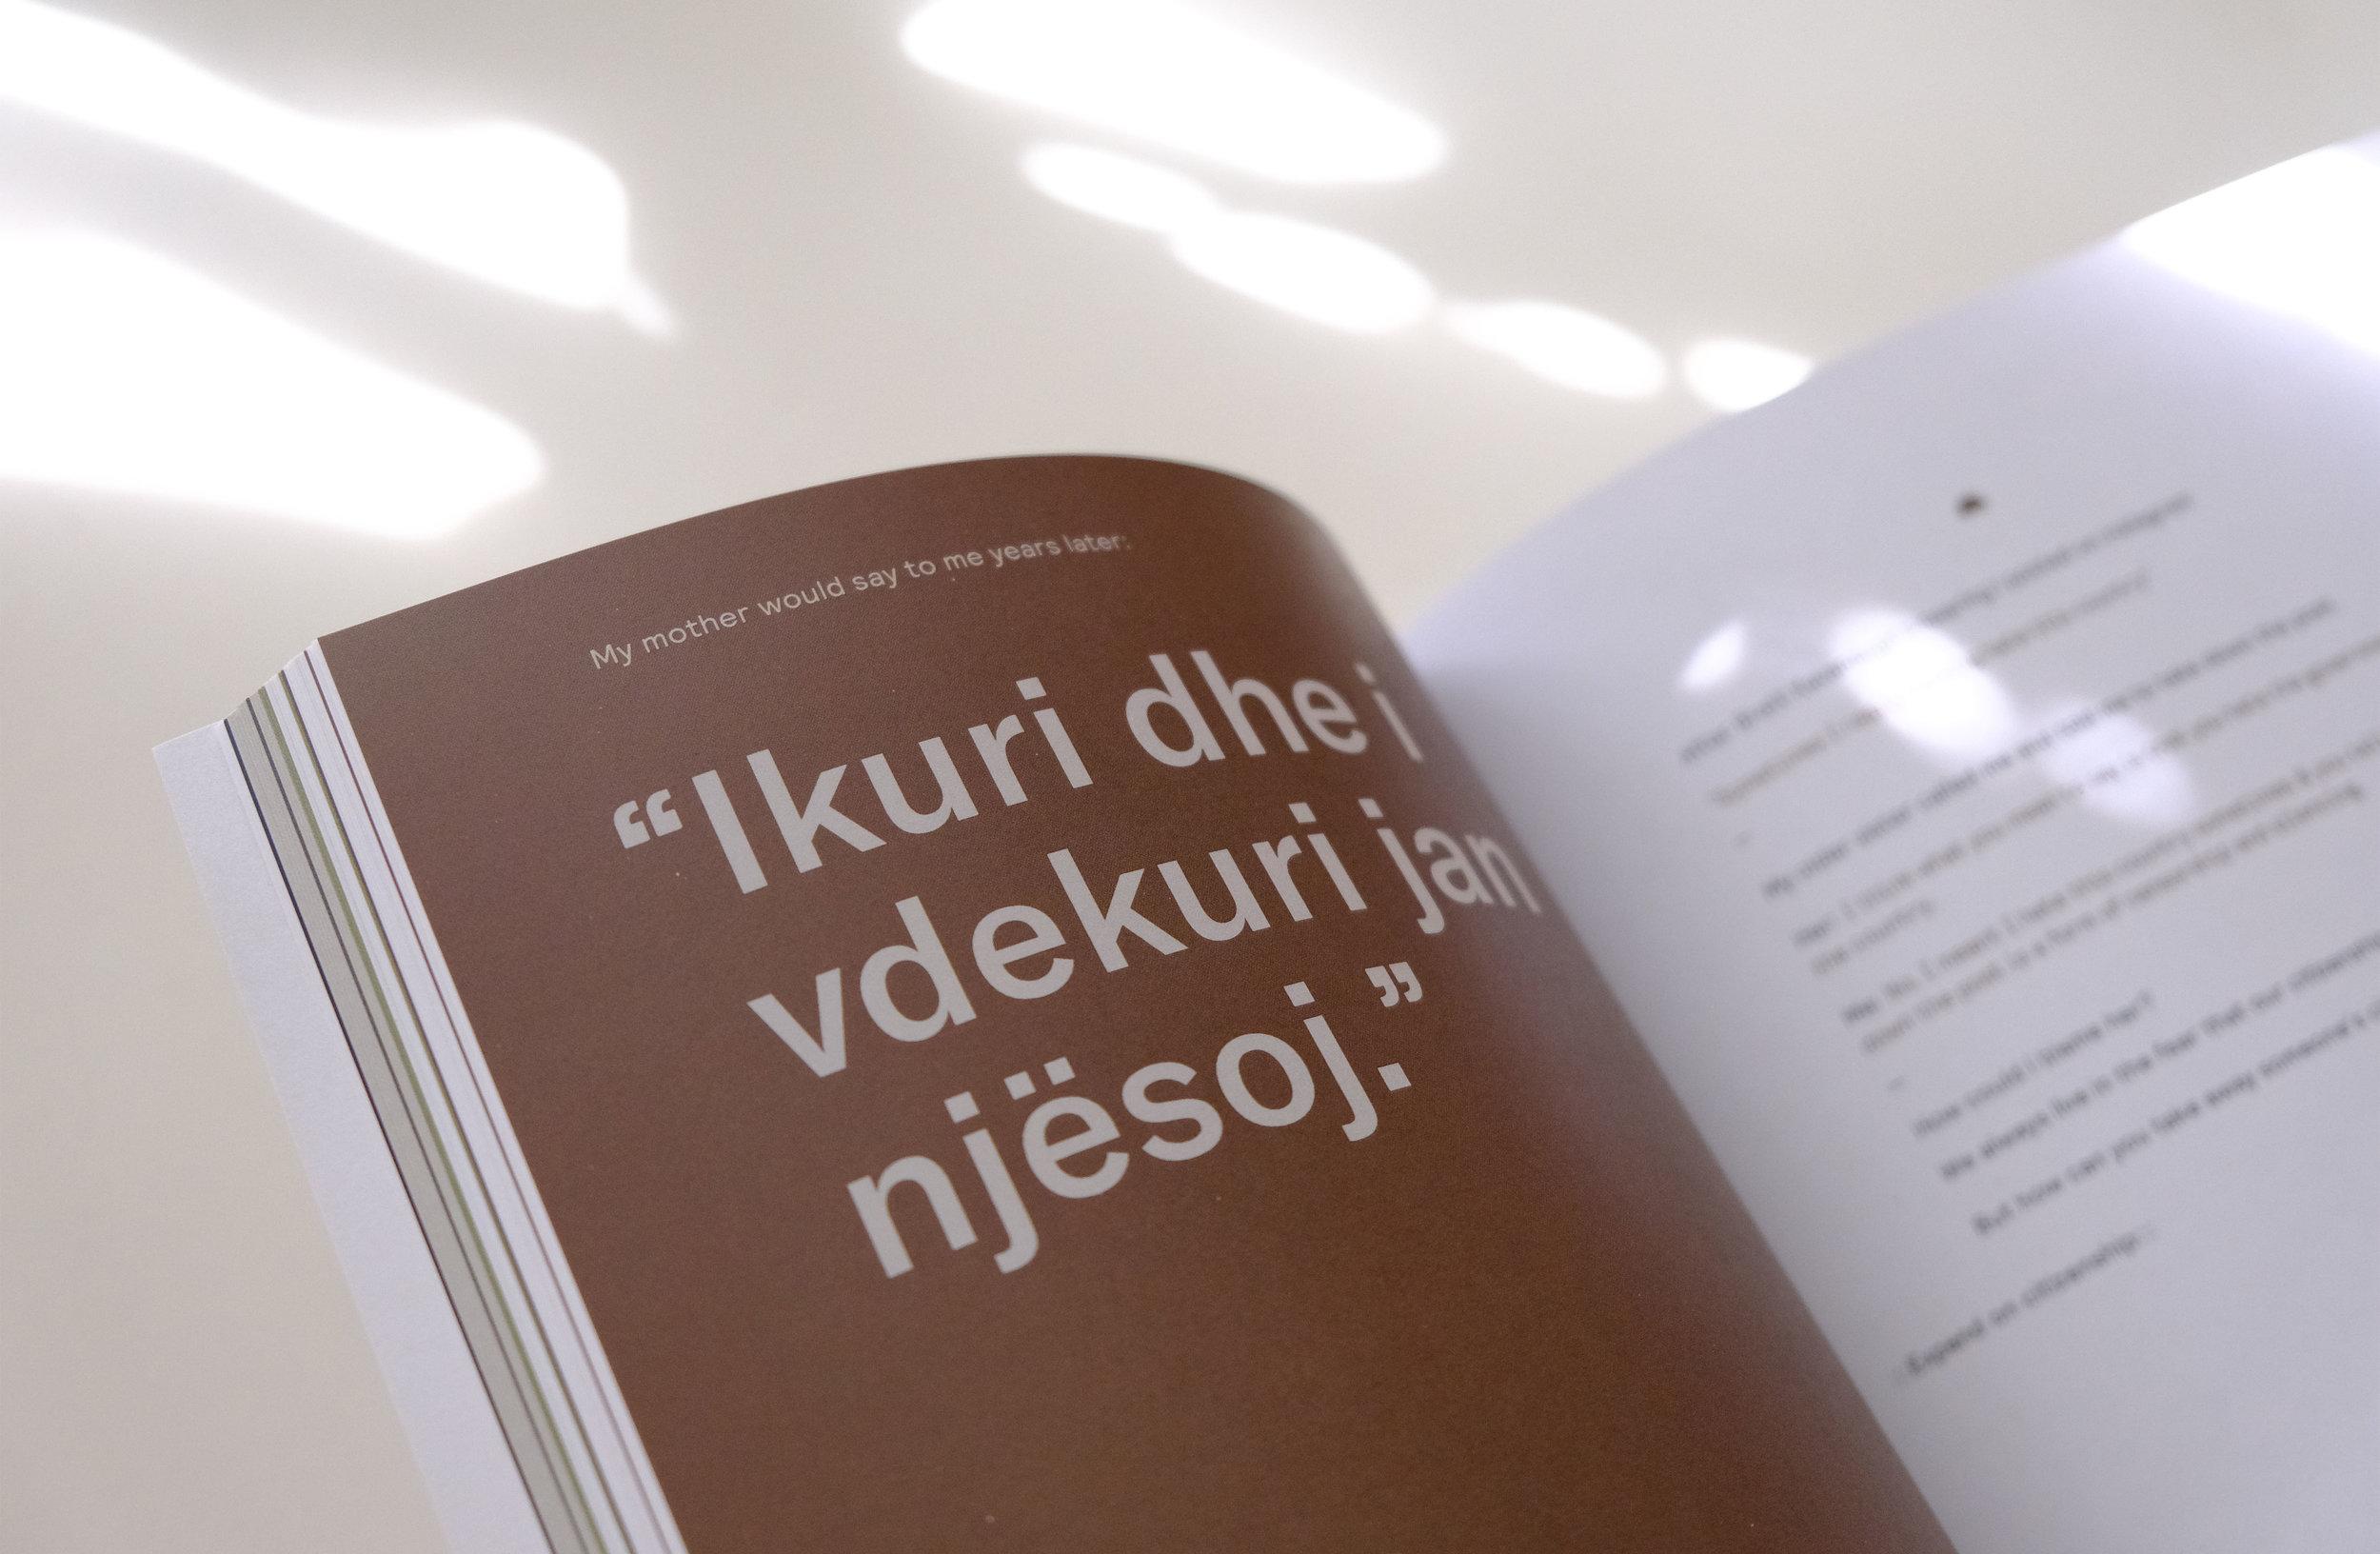 hamerika_book_shots_0012_DSCF0378.jpg